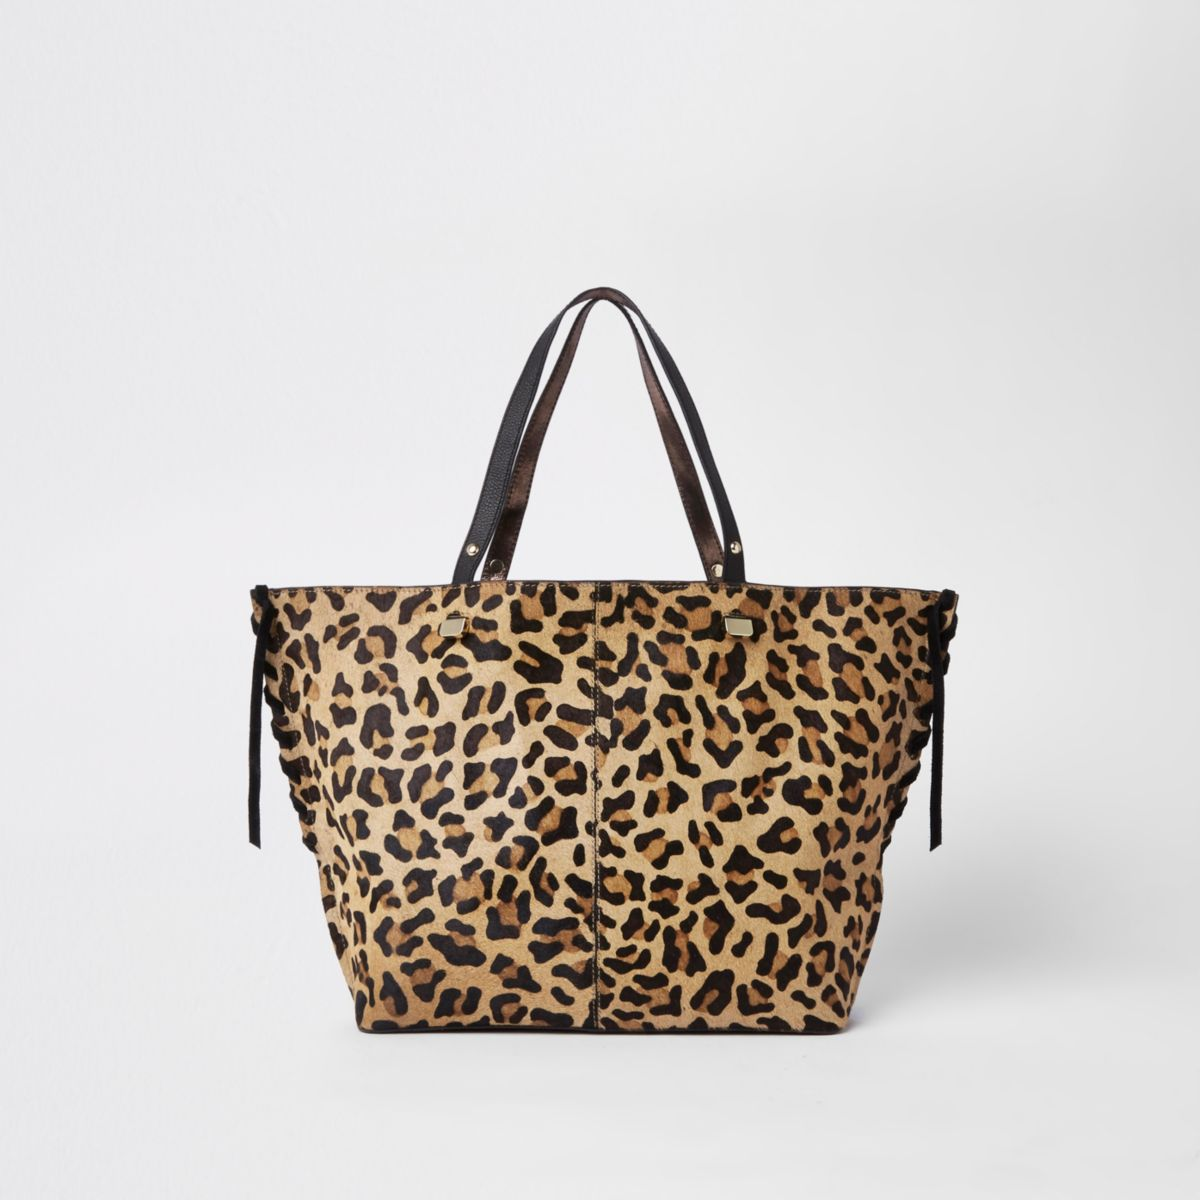 Brown leopard print leather shopper bag